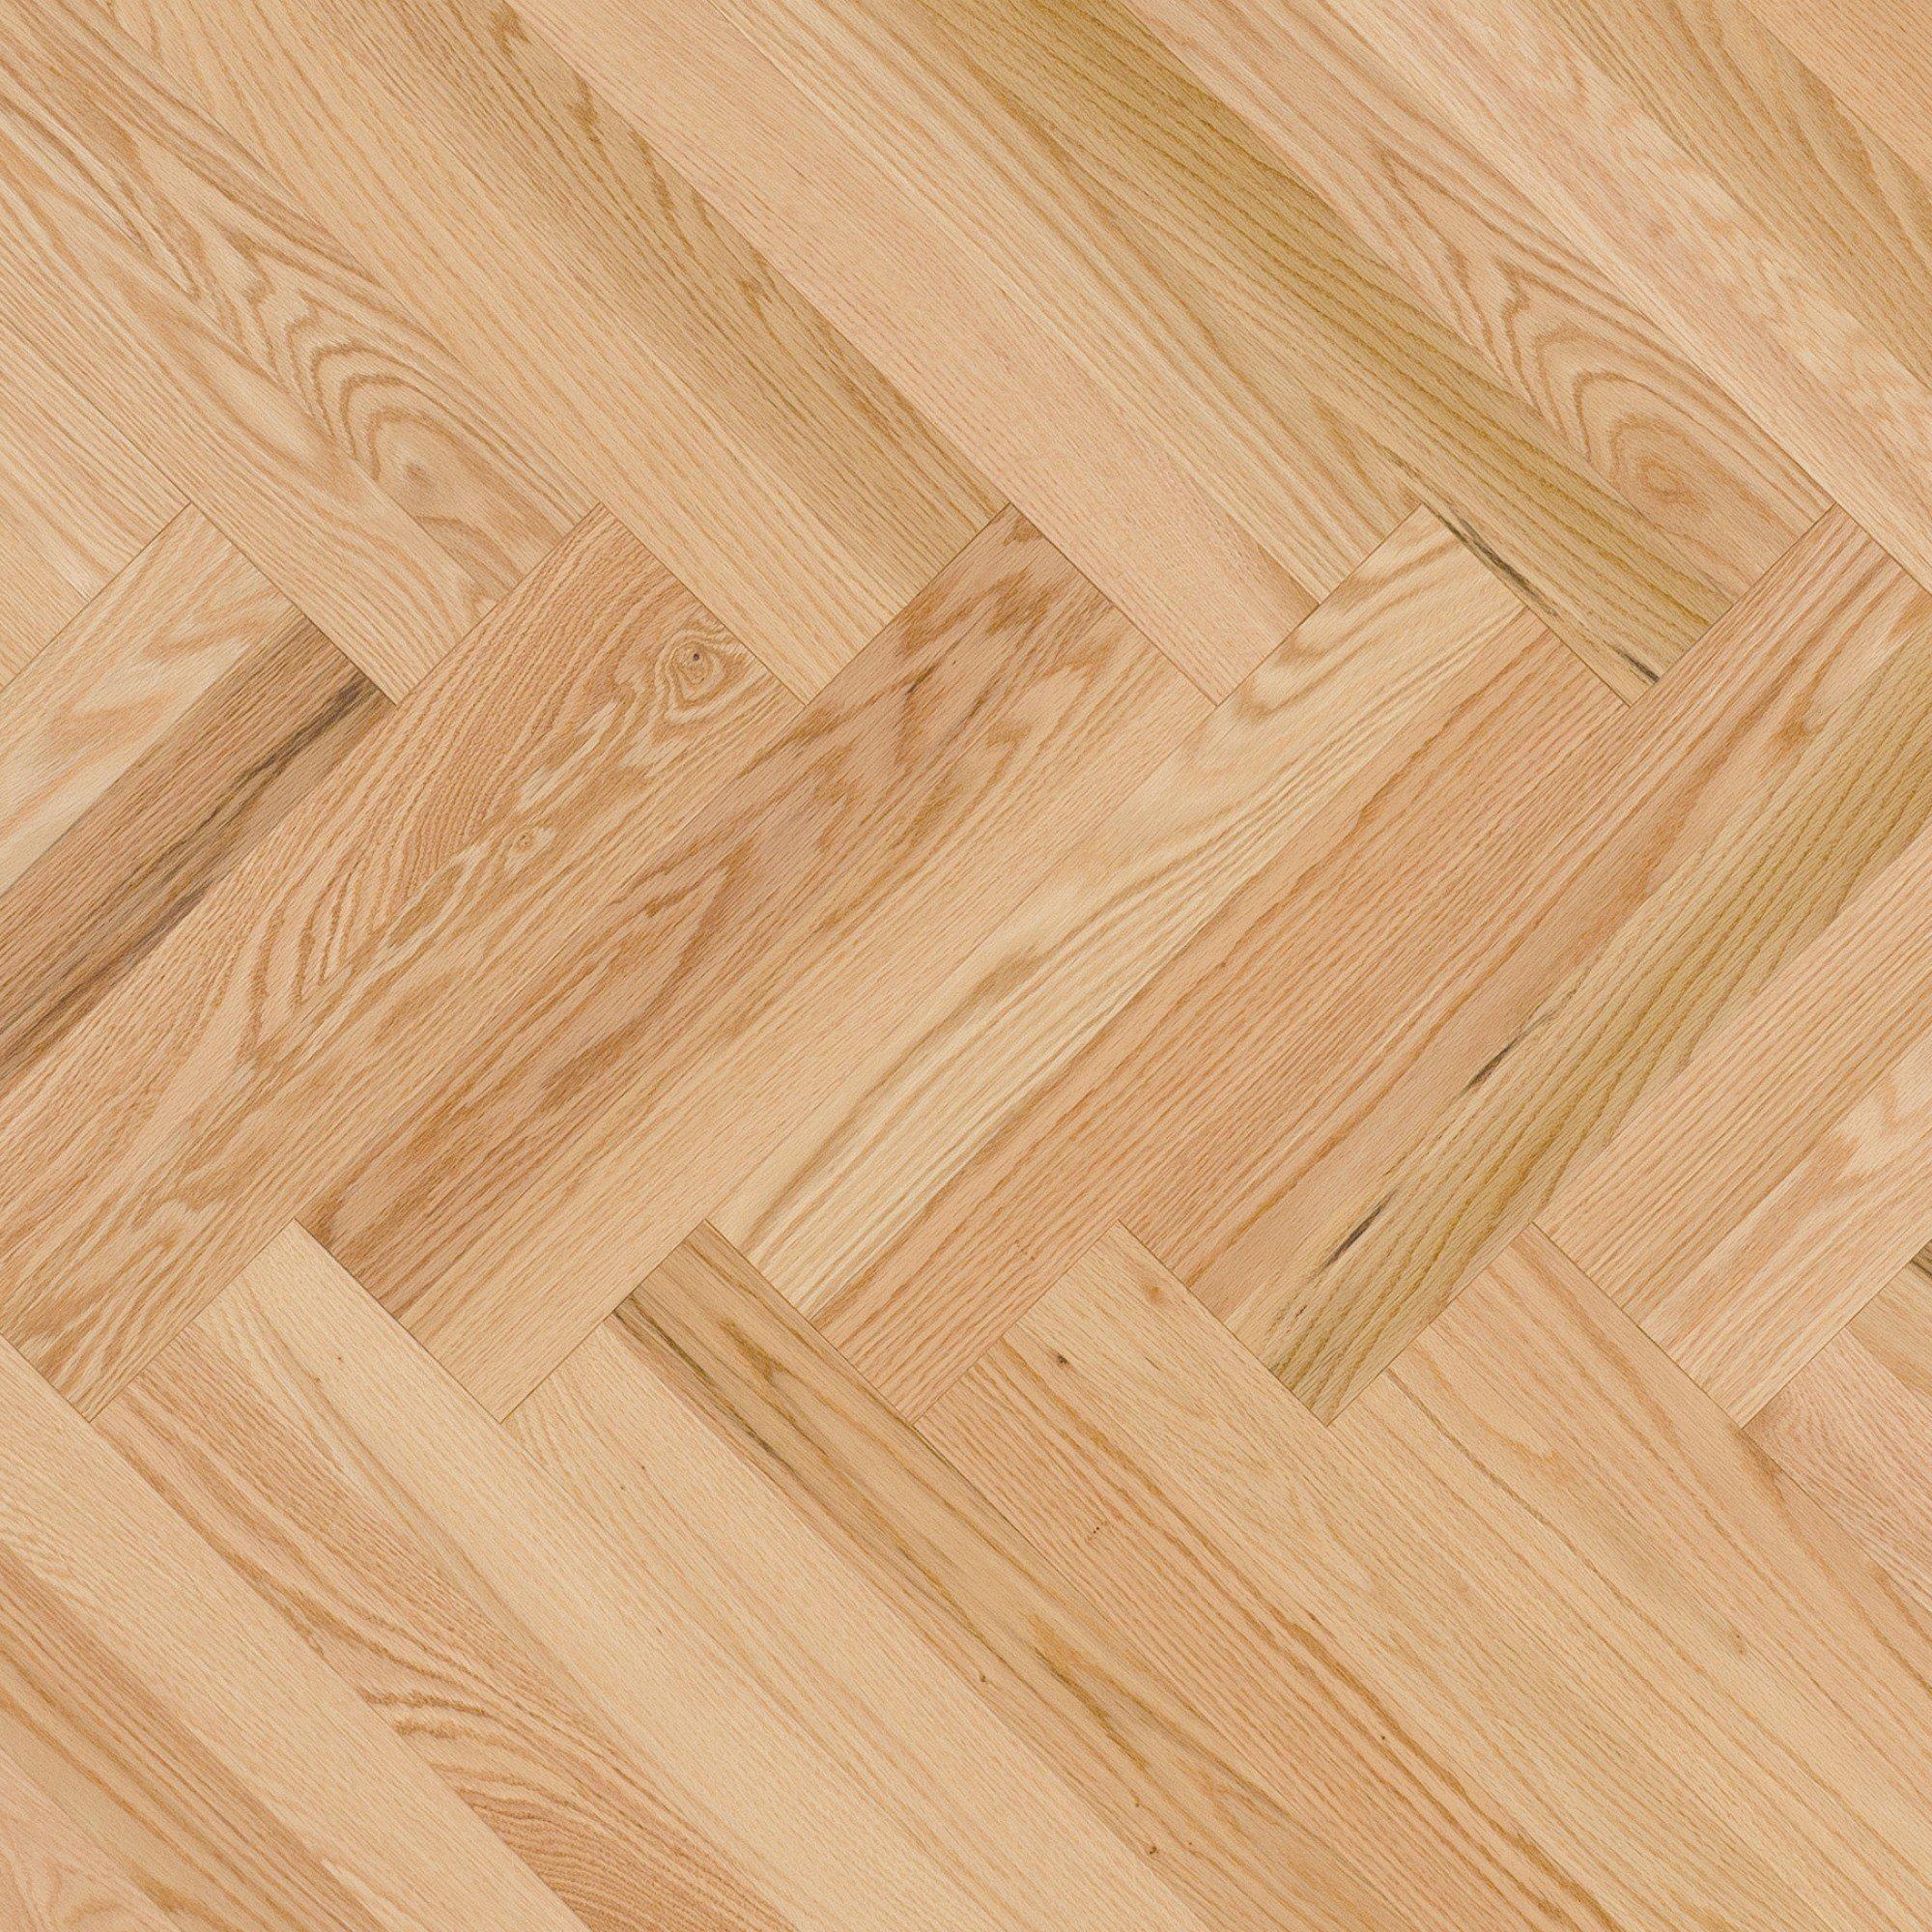 Red Oak Exclusive Smooth - Floor image